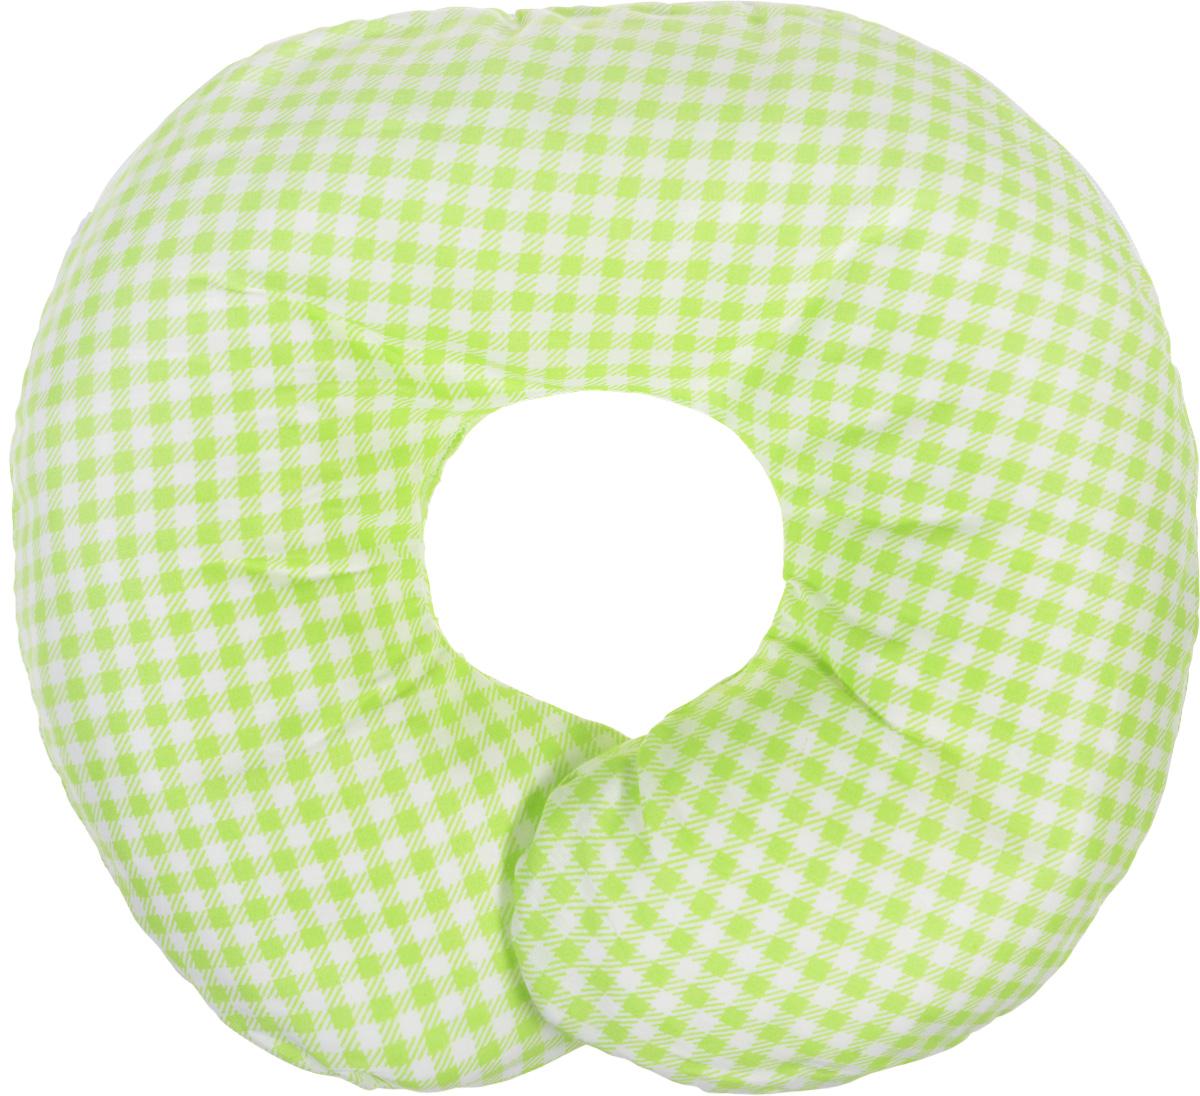 Selby Подушка-воротник для младенца цвет салатовый белый 30 см х 25 см